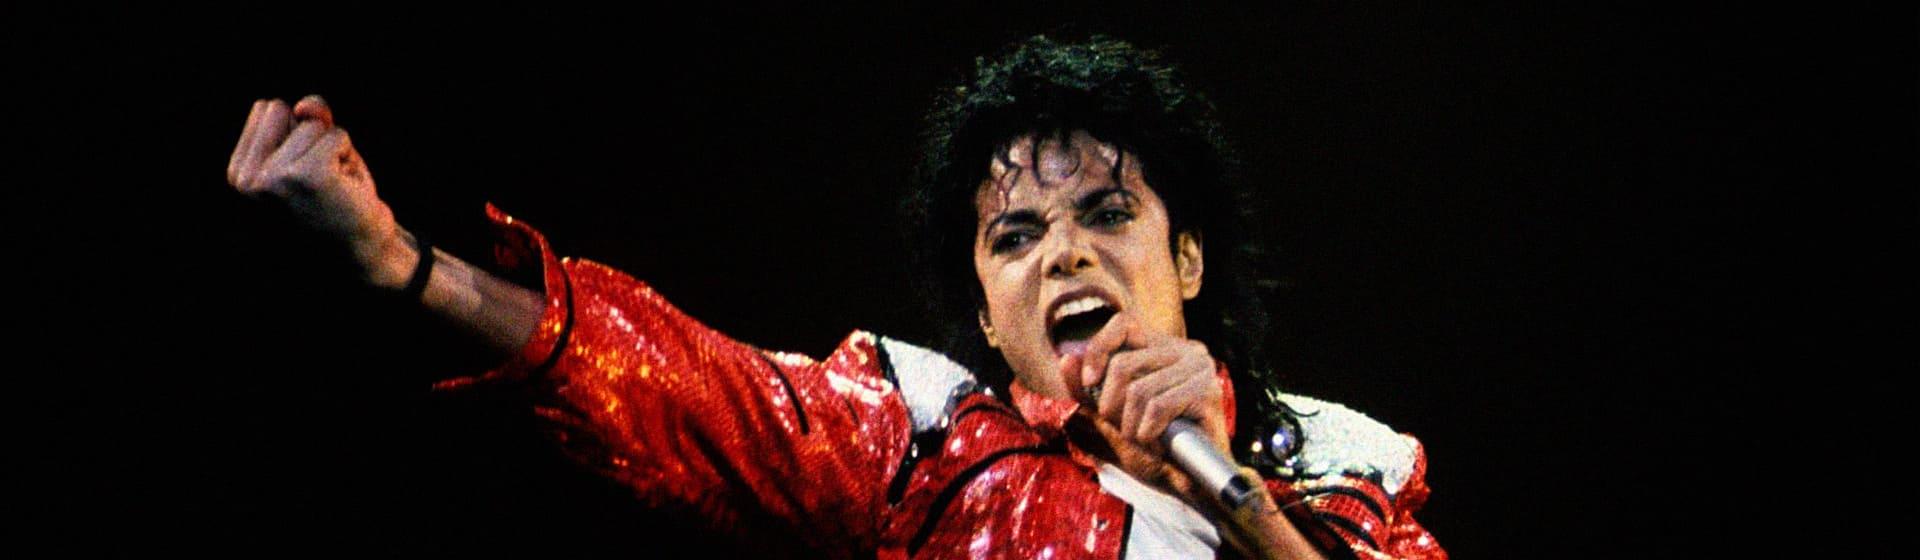 Michael Jackson - Женские толстовки